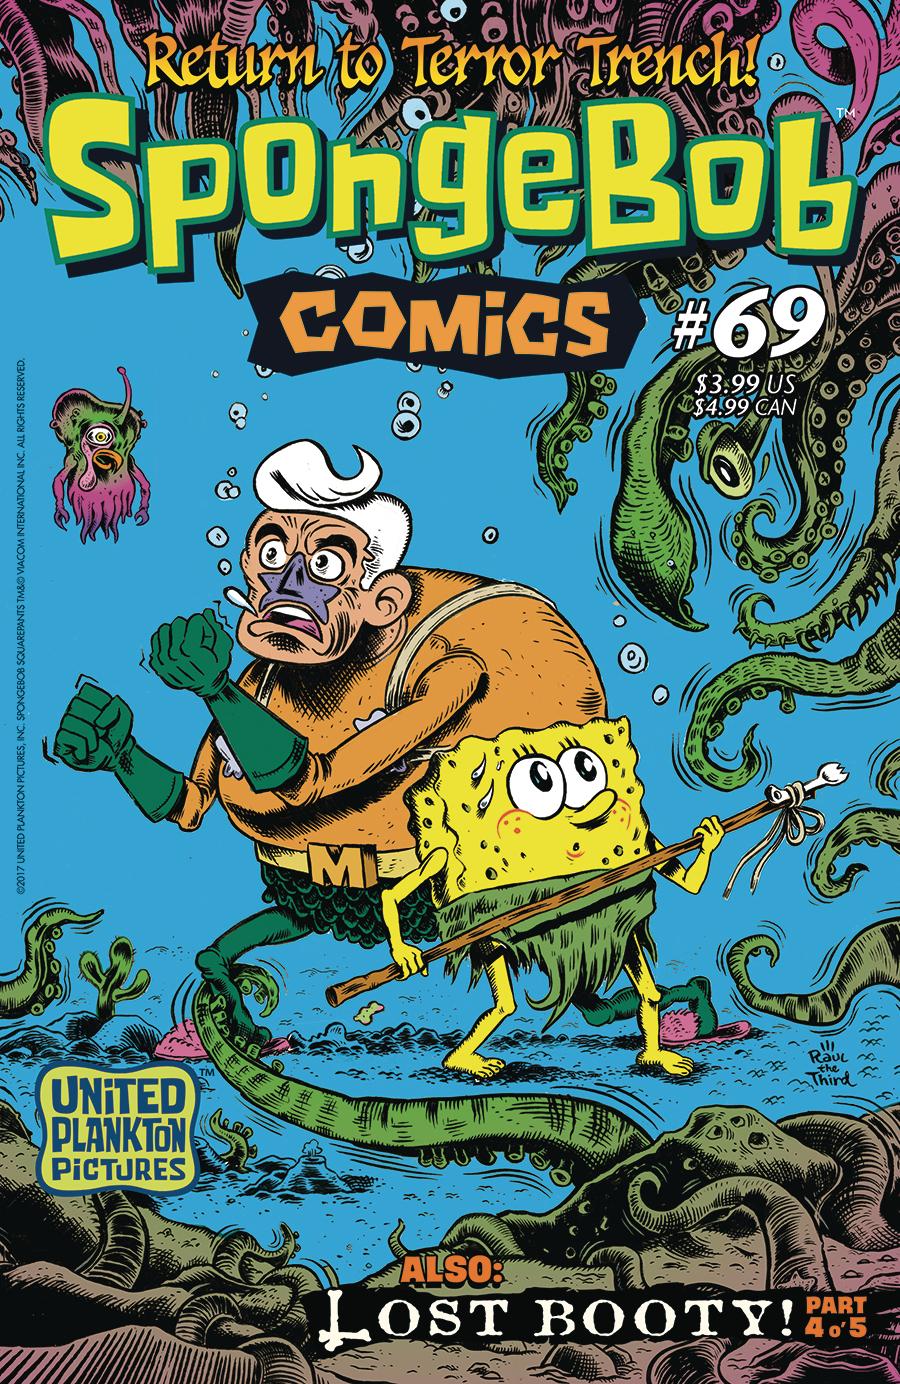 SPONGEBOB-COMICS-69.jpg